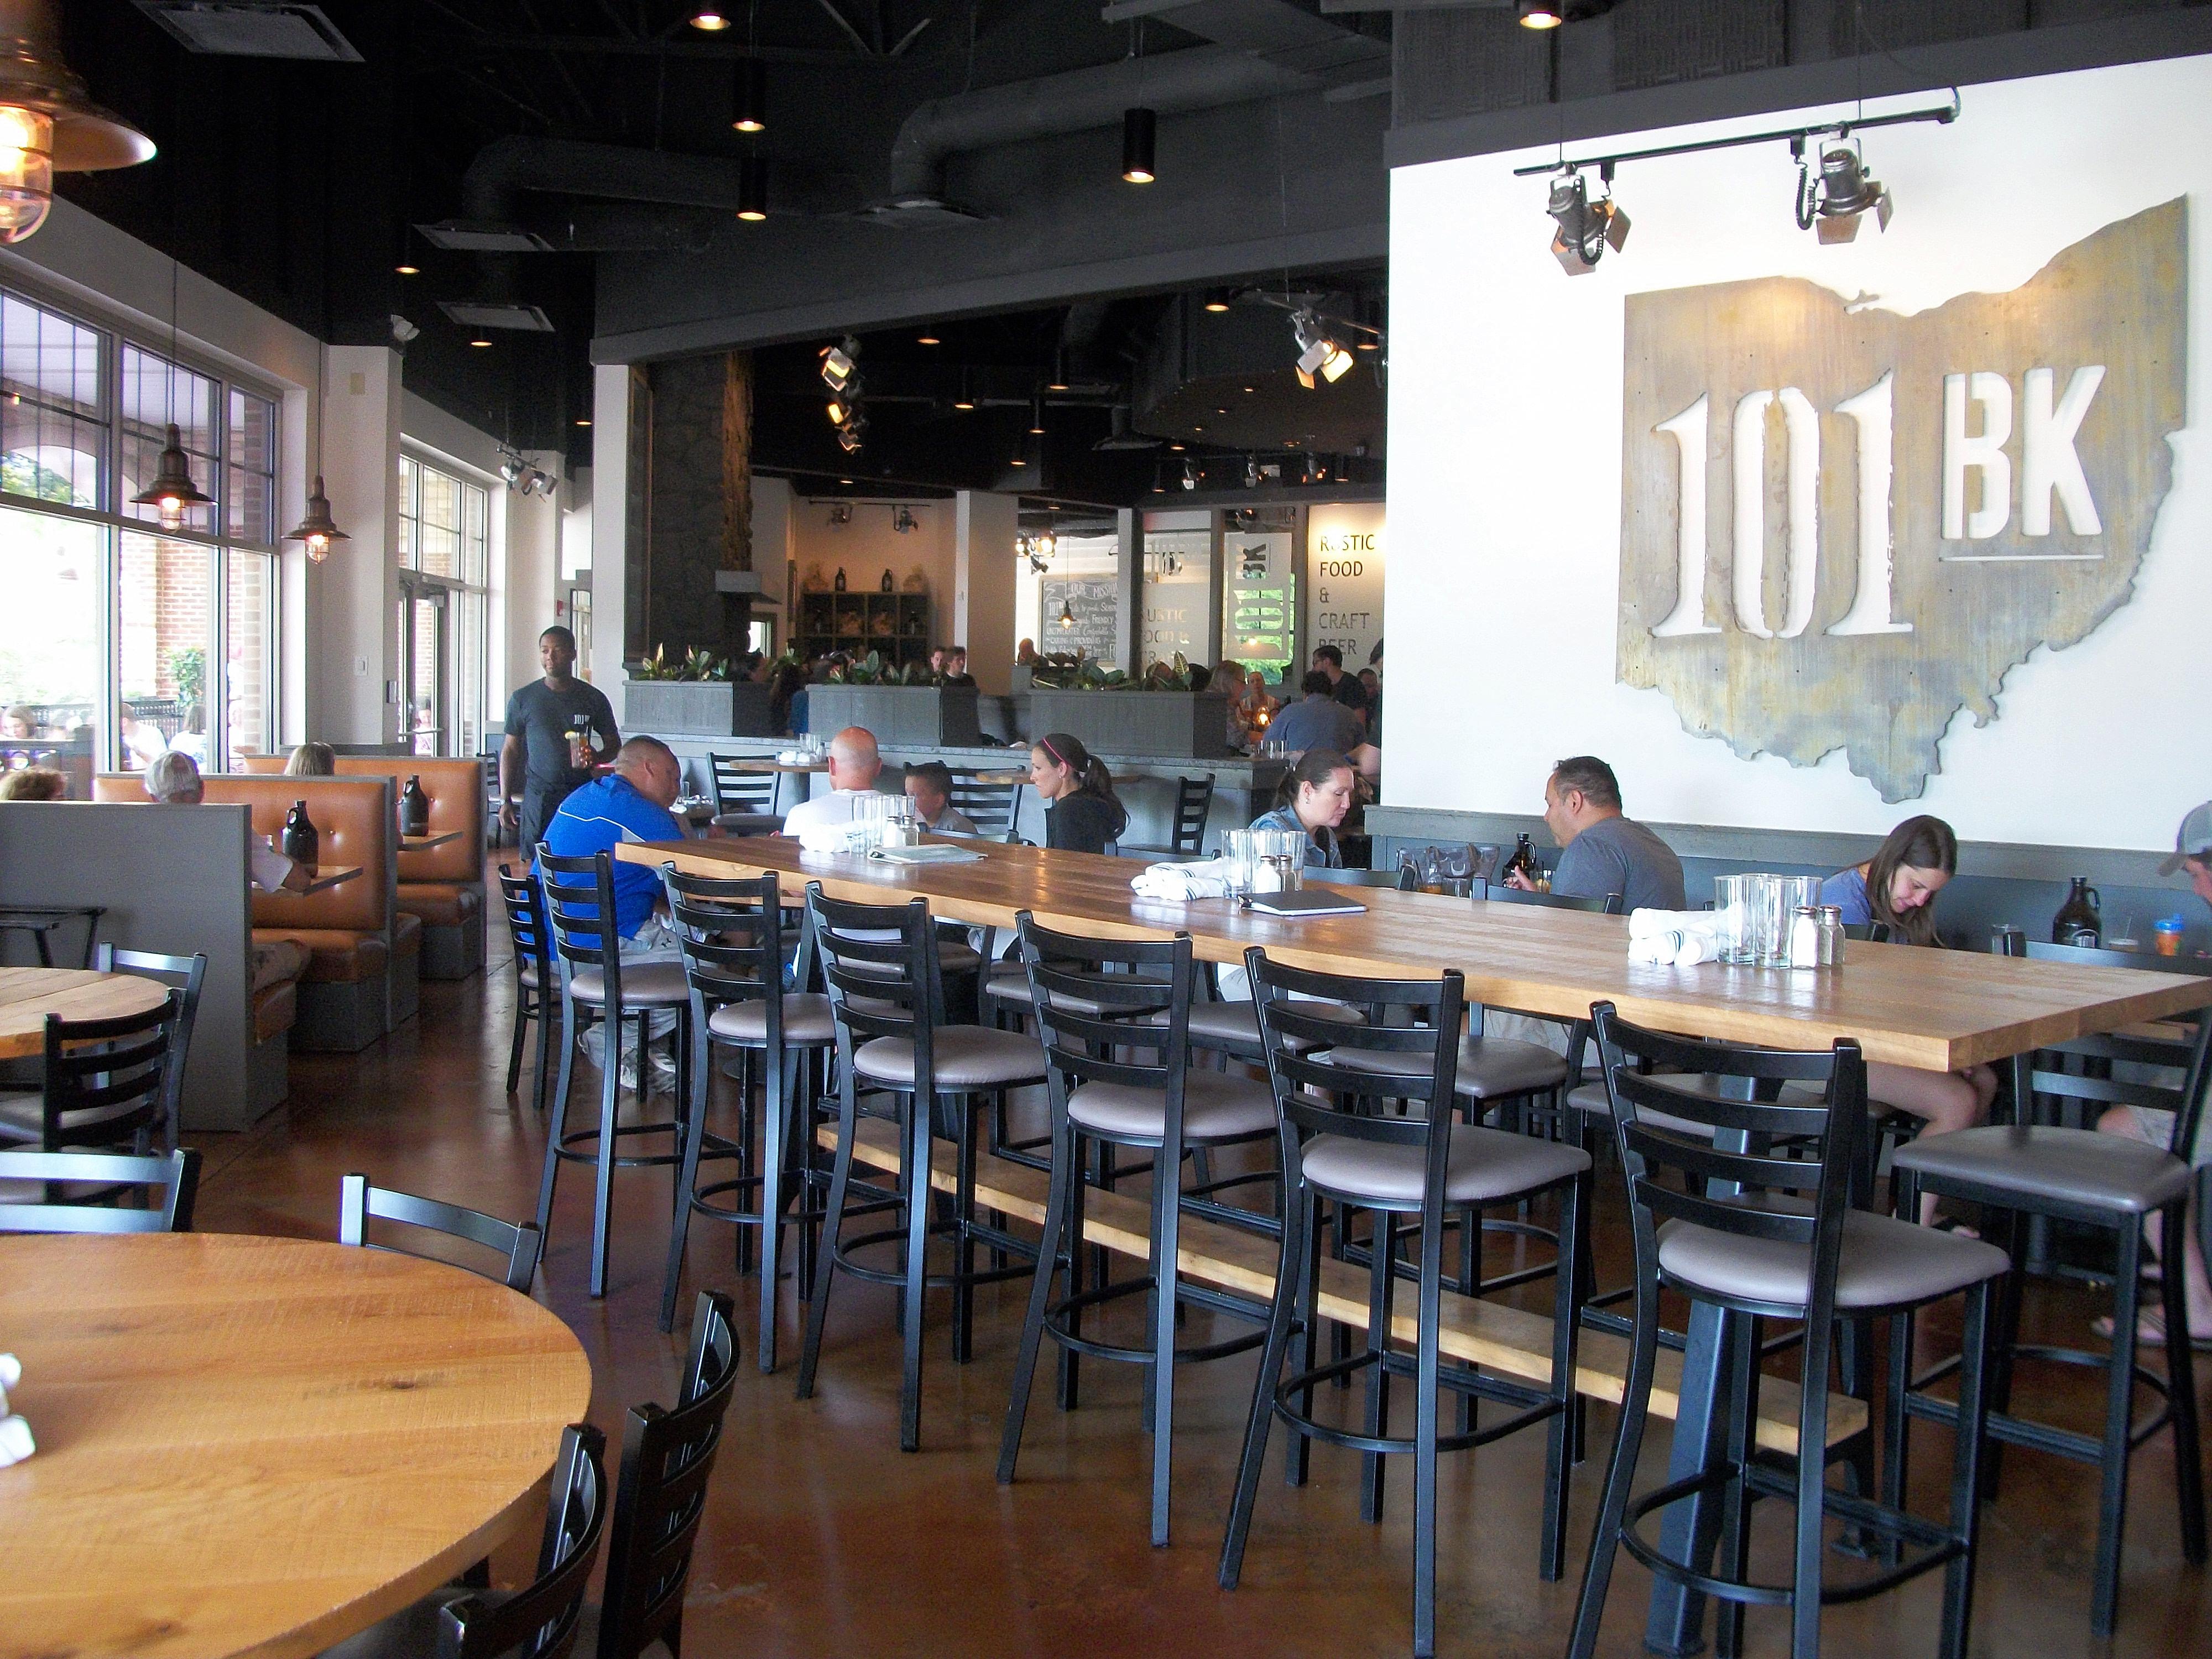 101 Beer Kitchen – Dublin, OH